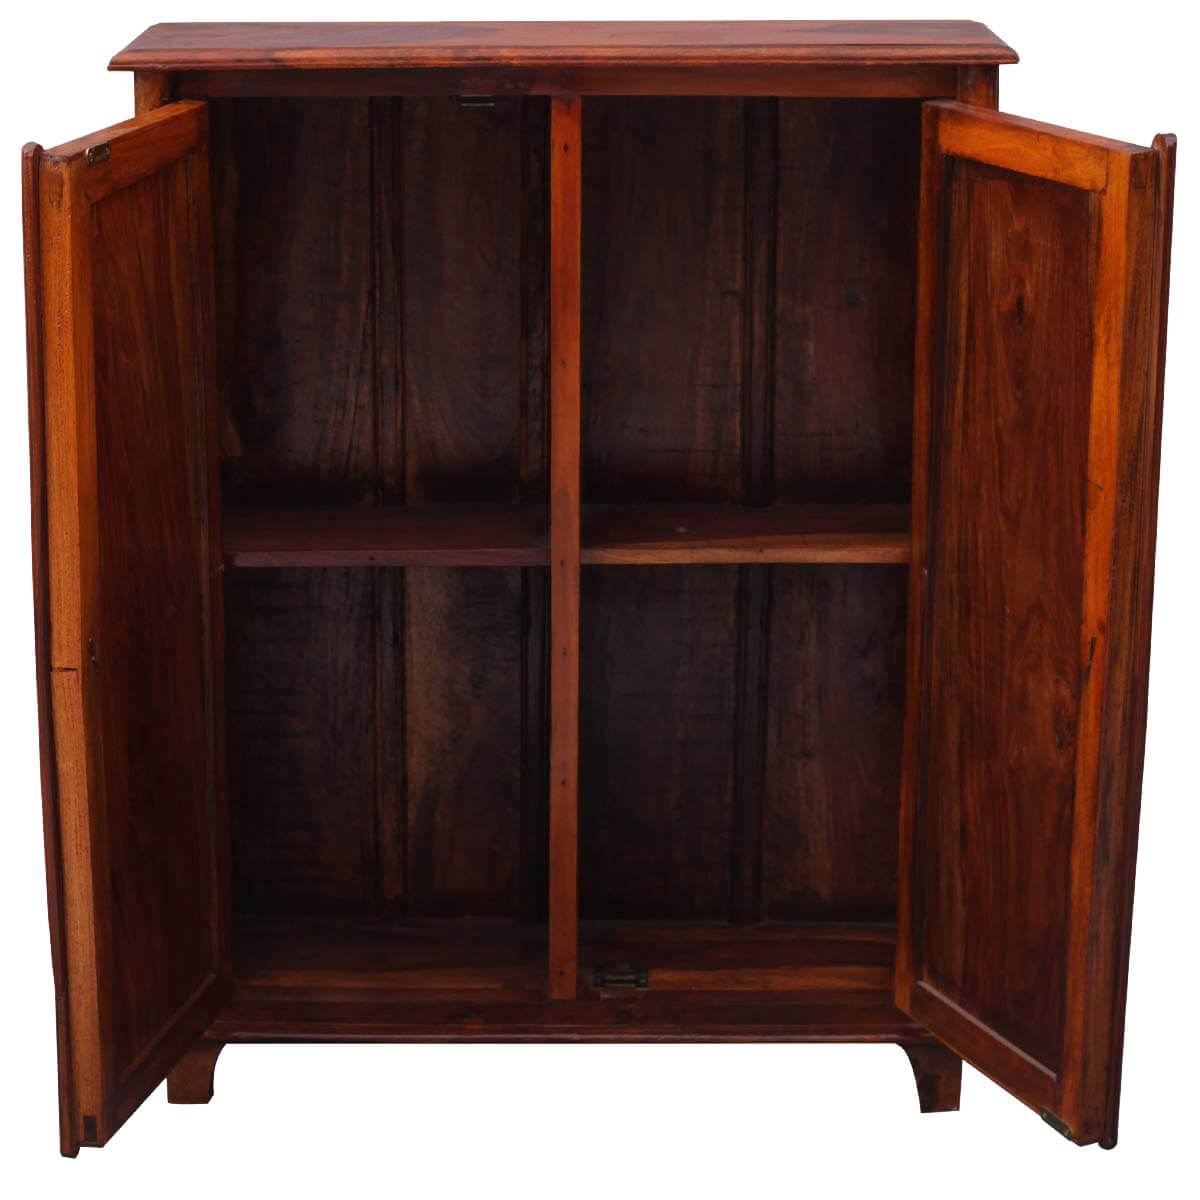 Sayreville Solid Wood Kitchen Storage Cabinet